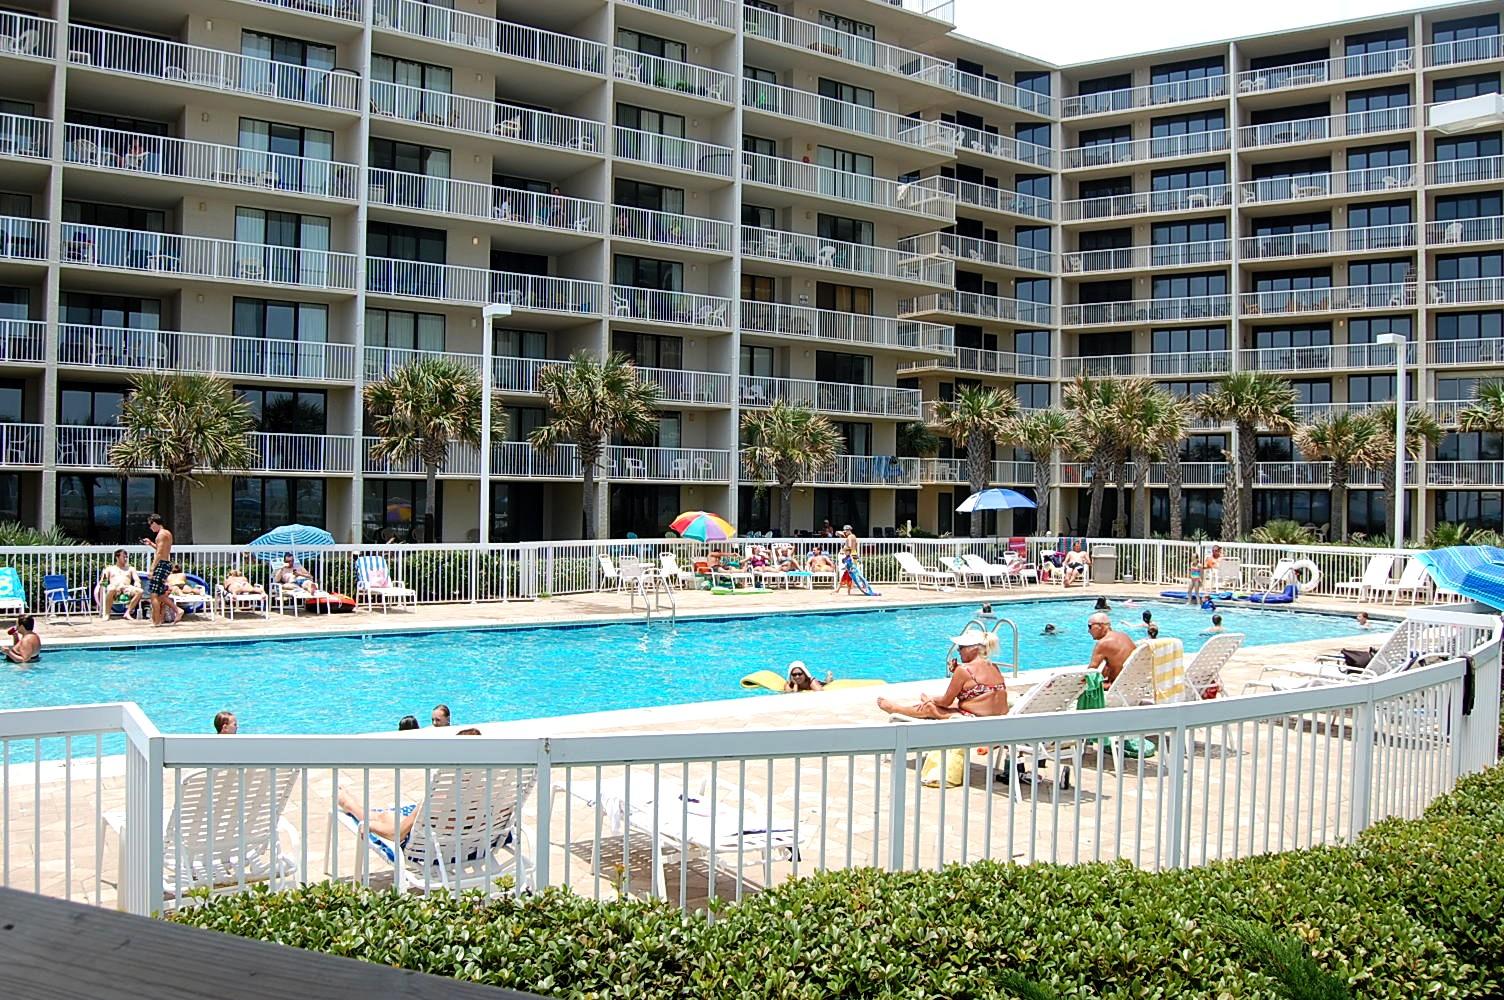 Seaside Beach & Racquet 5415 Condo rental in Seaside Beach and Racquet Club in Orange Beach Alabama - #4